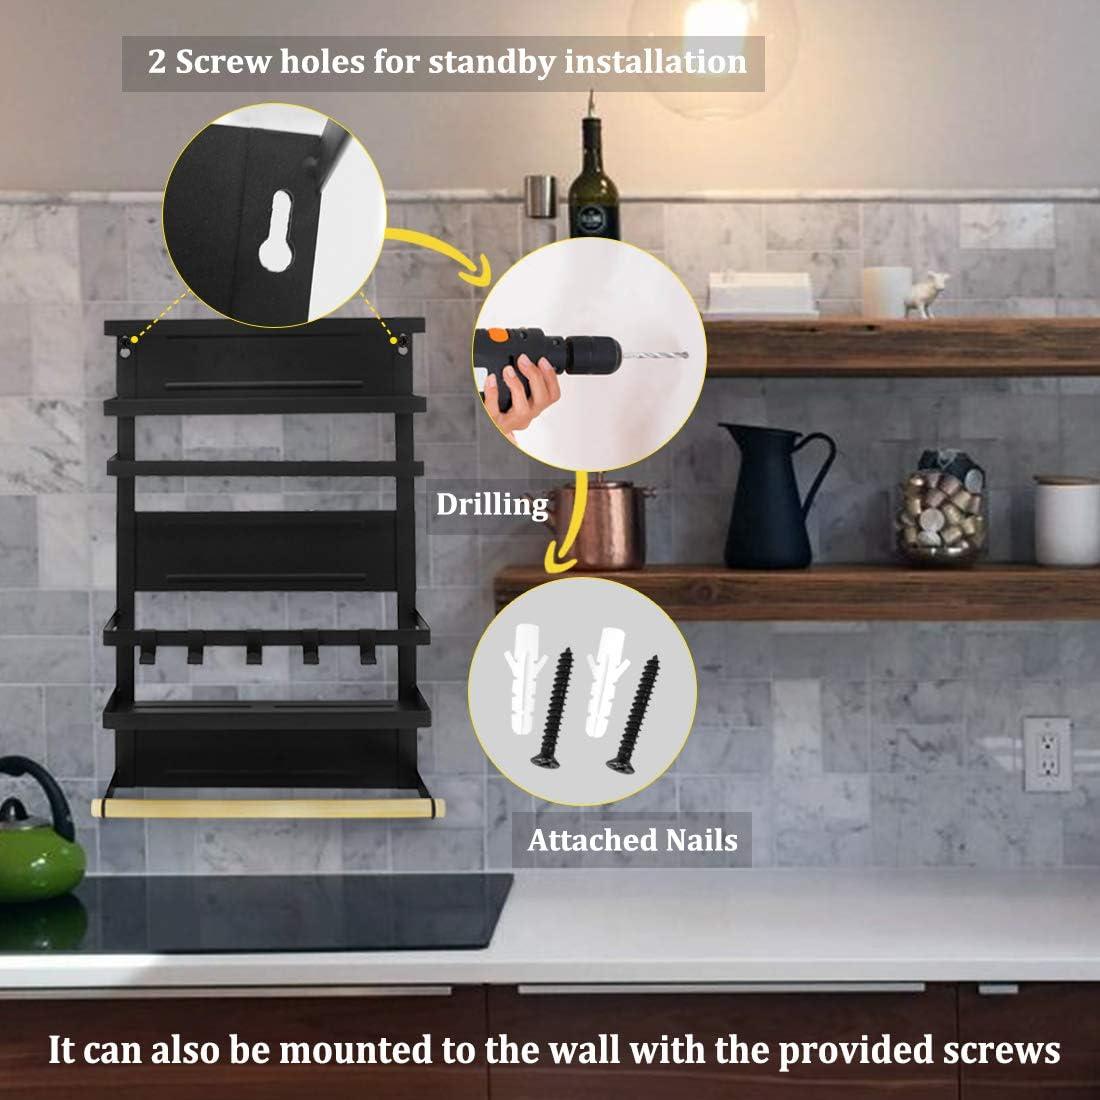 Large,Black Haturi Magnetic Shelf Magnetic Paper Towel Holder Fridge Spice Rack Kitchen Refrigerator Organizer Rack with 5 Removable Hooks